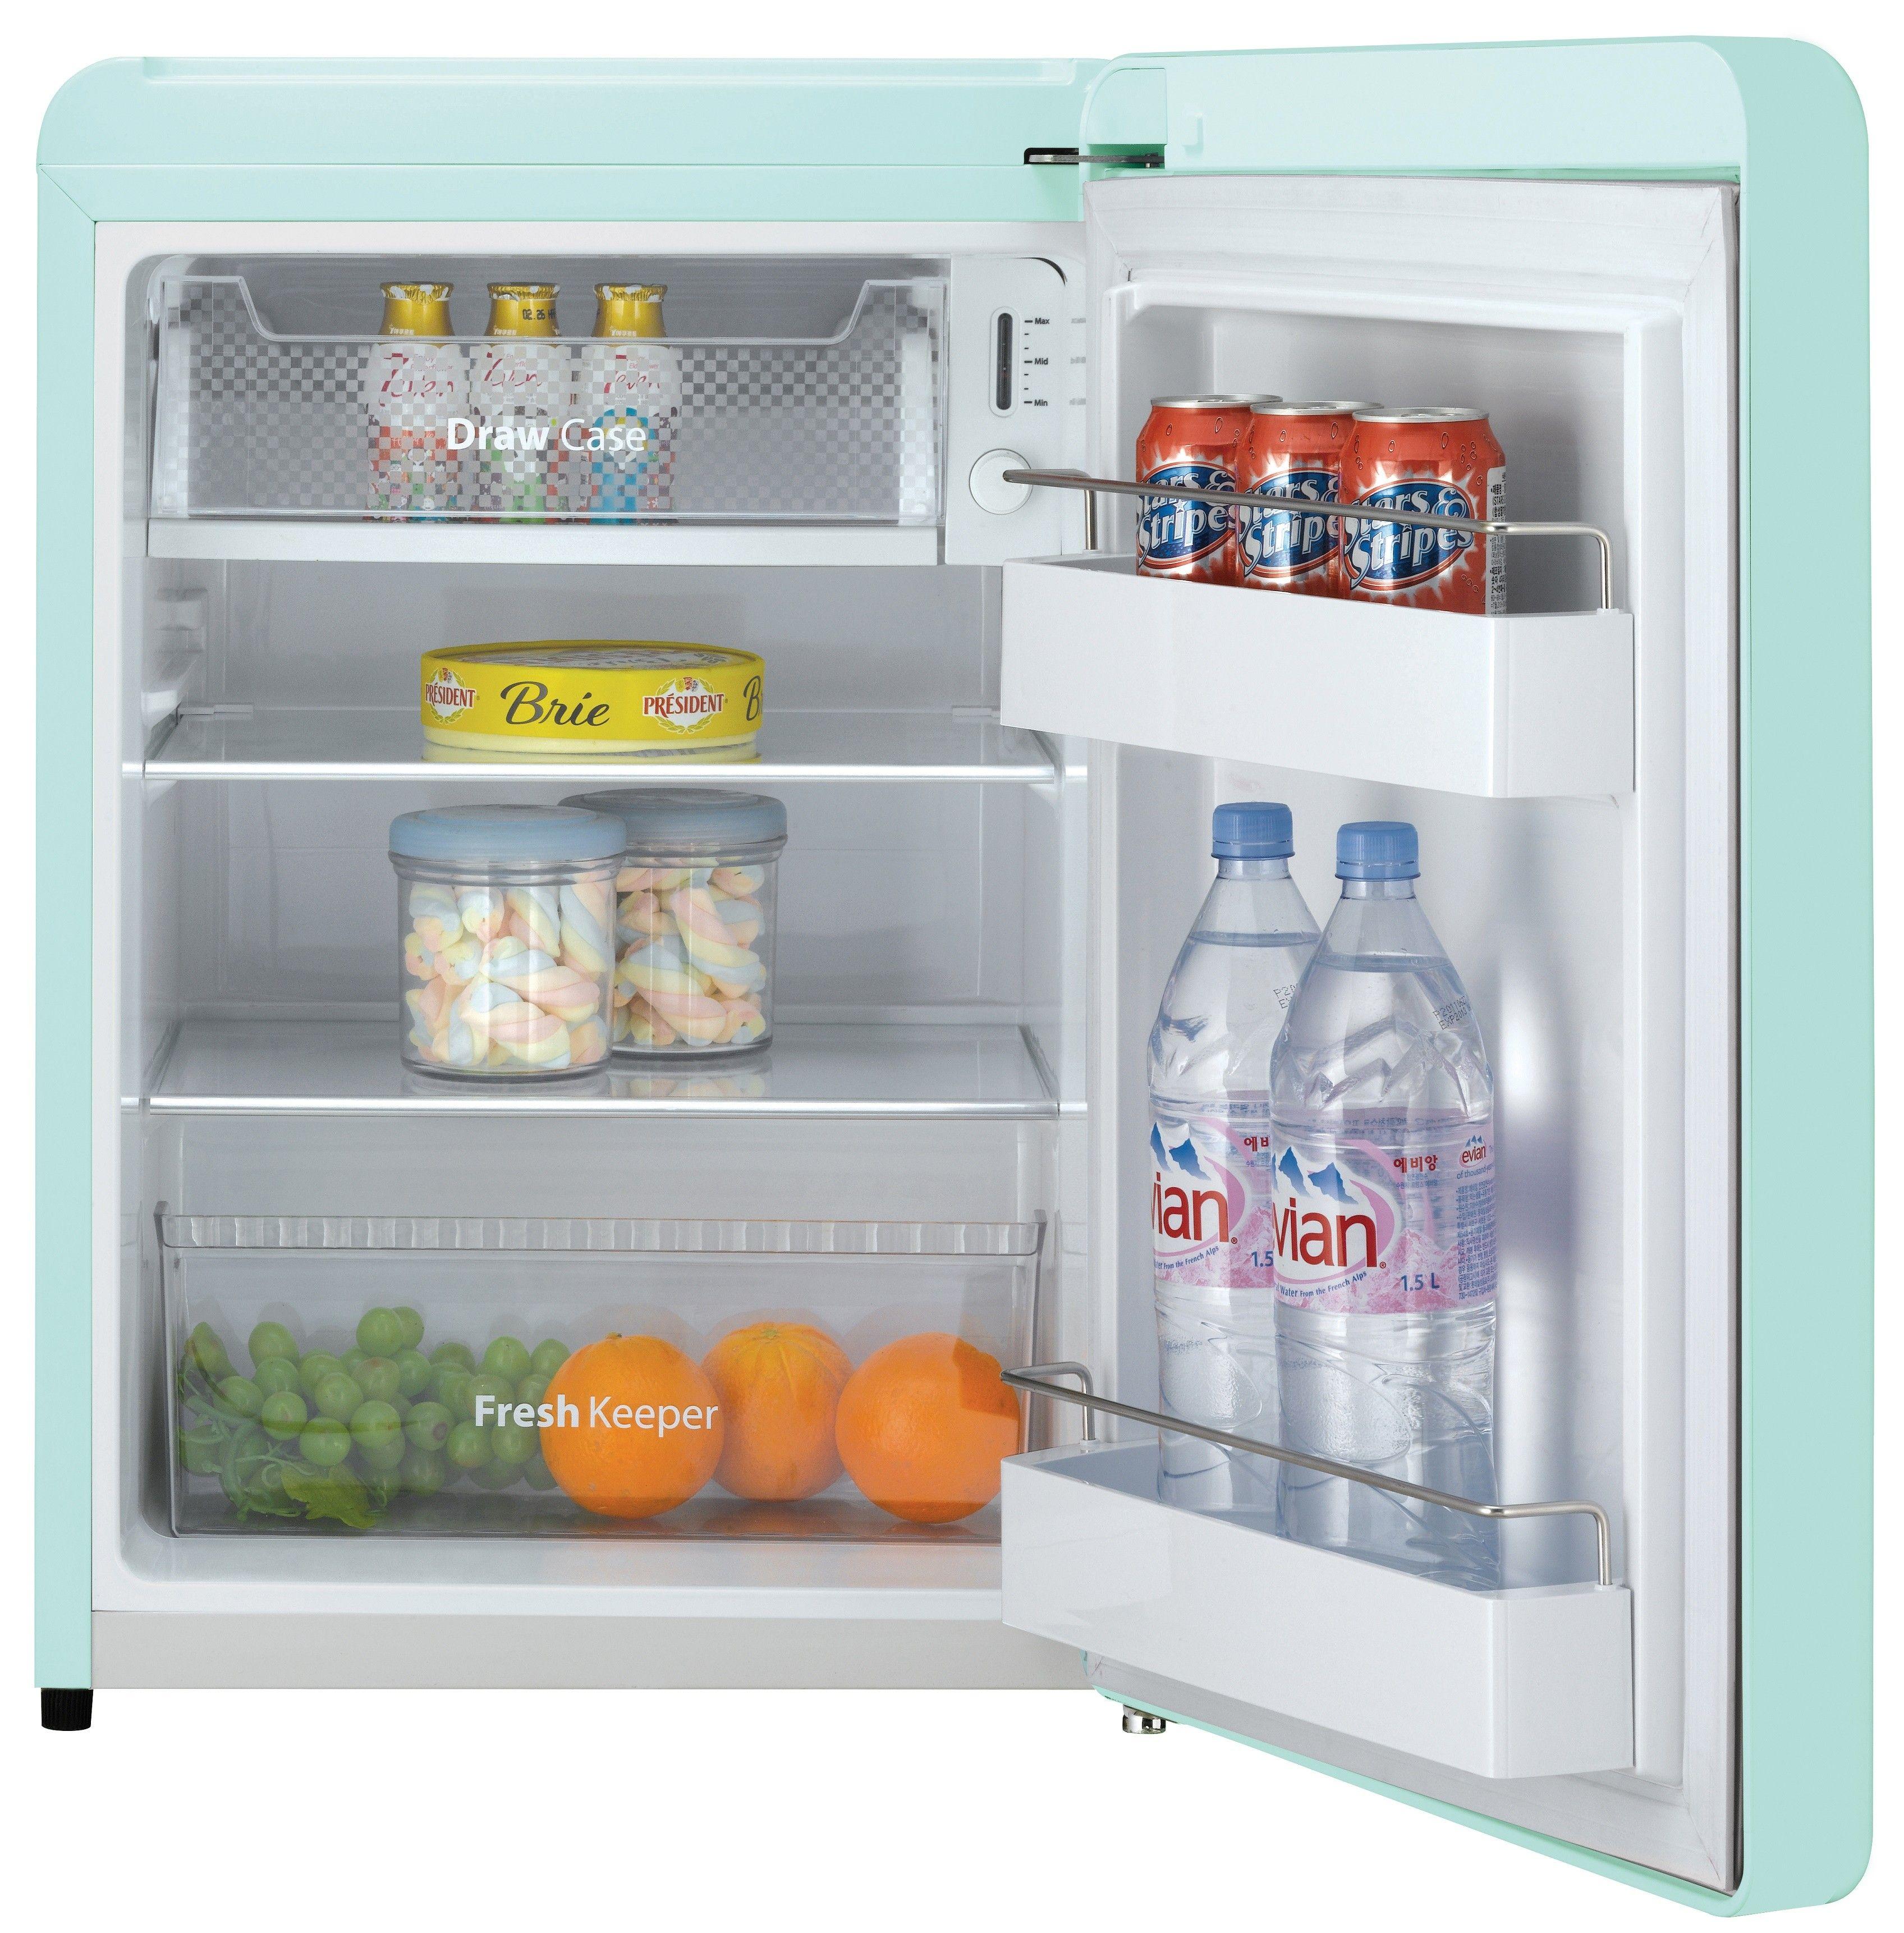 daewoo retro compact refrigerator 2 8 cu ft mint green rh pinterest com